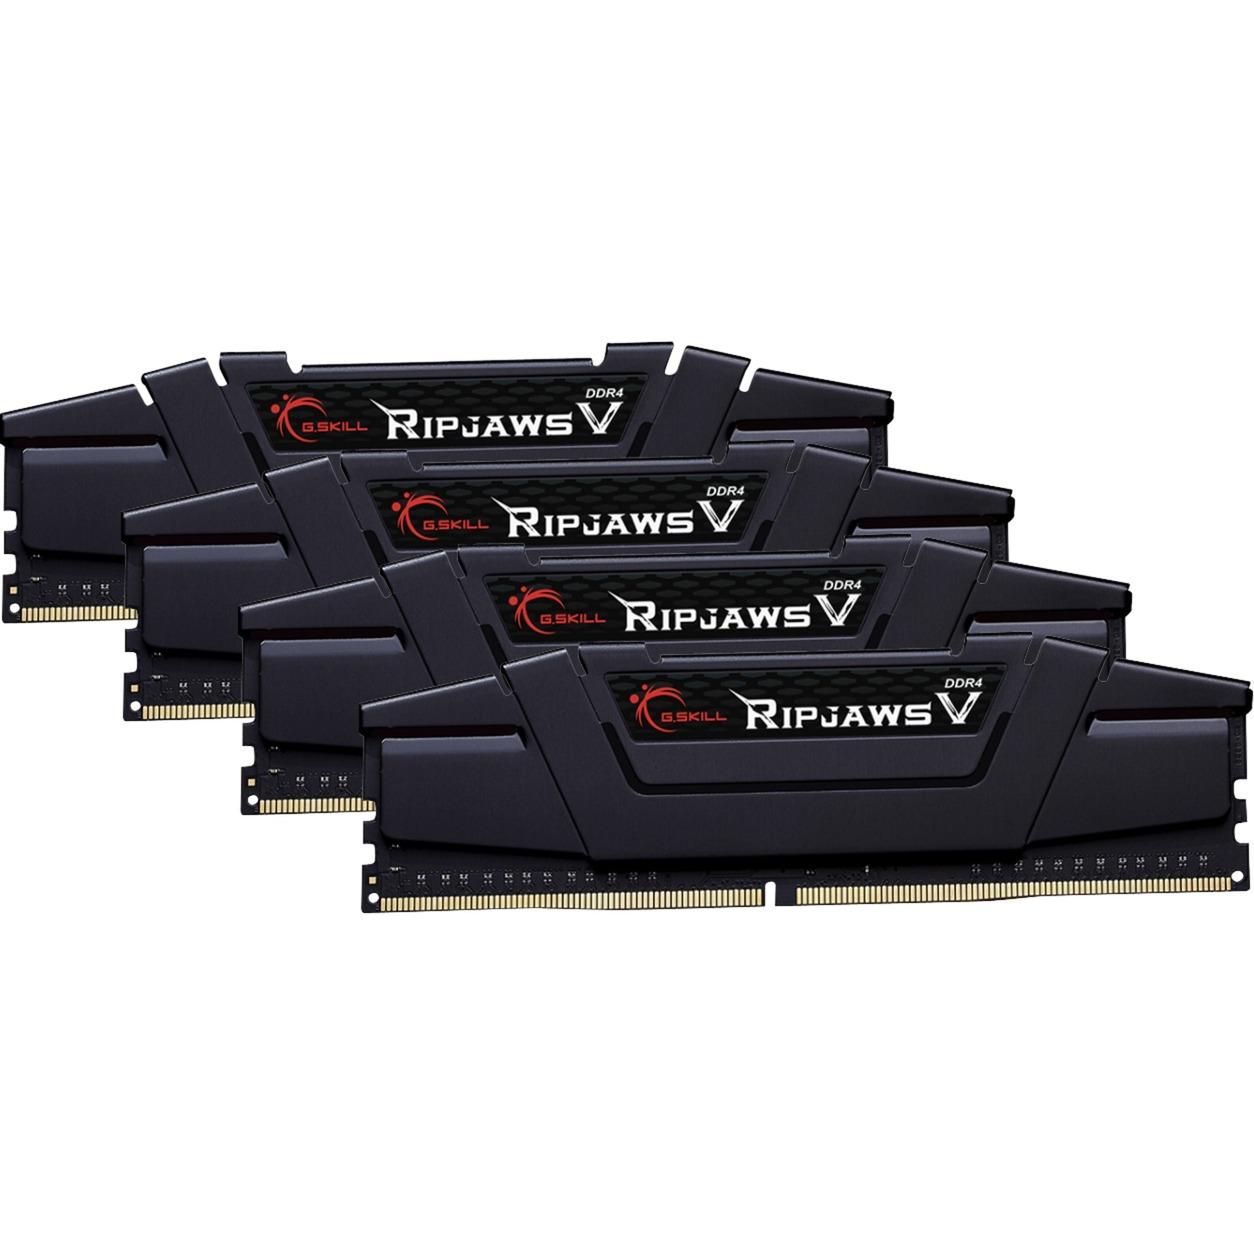 D416GB 3200-16-18-18 Ripjaws V K4 GSK, Mémoire